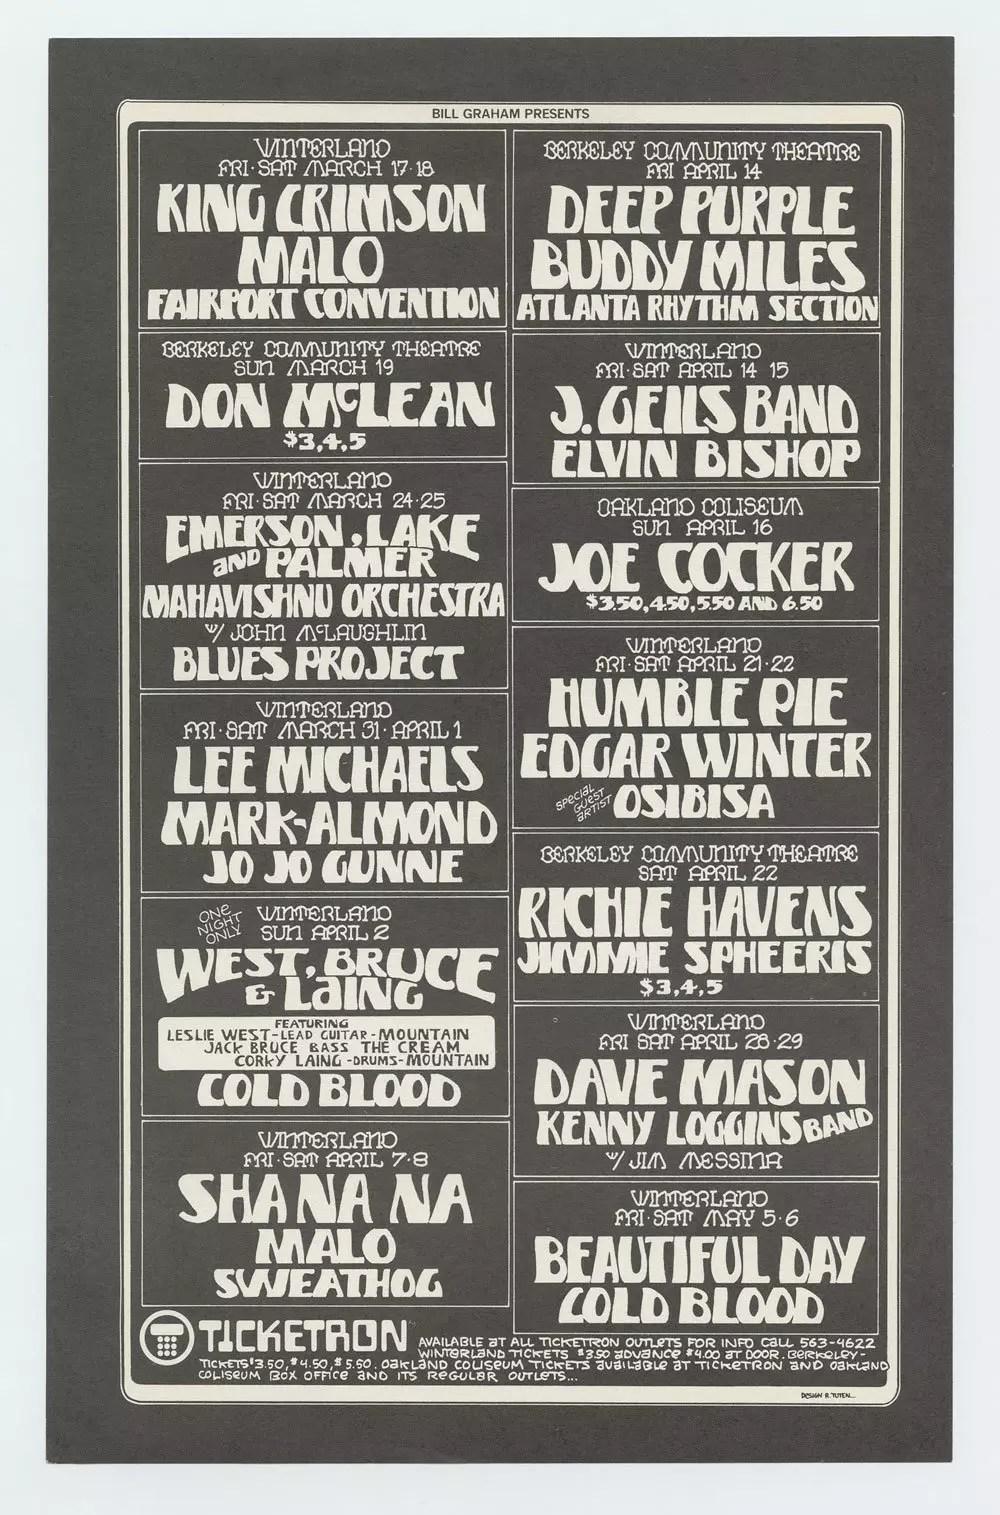 Bill Graham Presents Flyer 1972 March King Crimson Deep Purple Buddy Miles